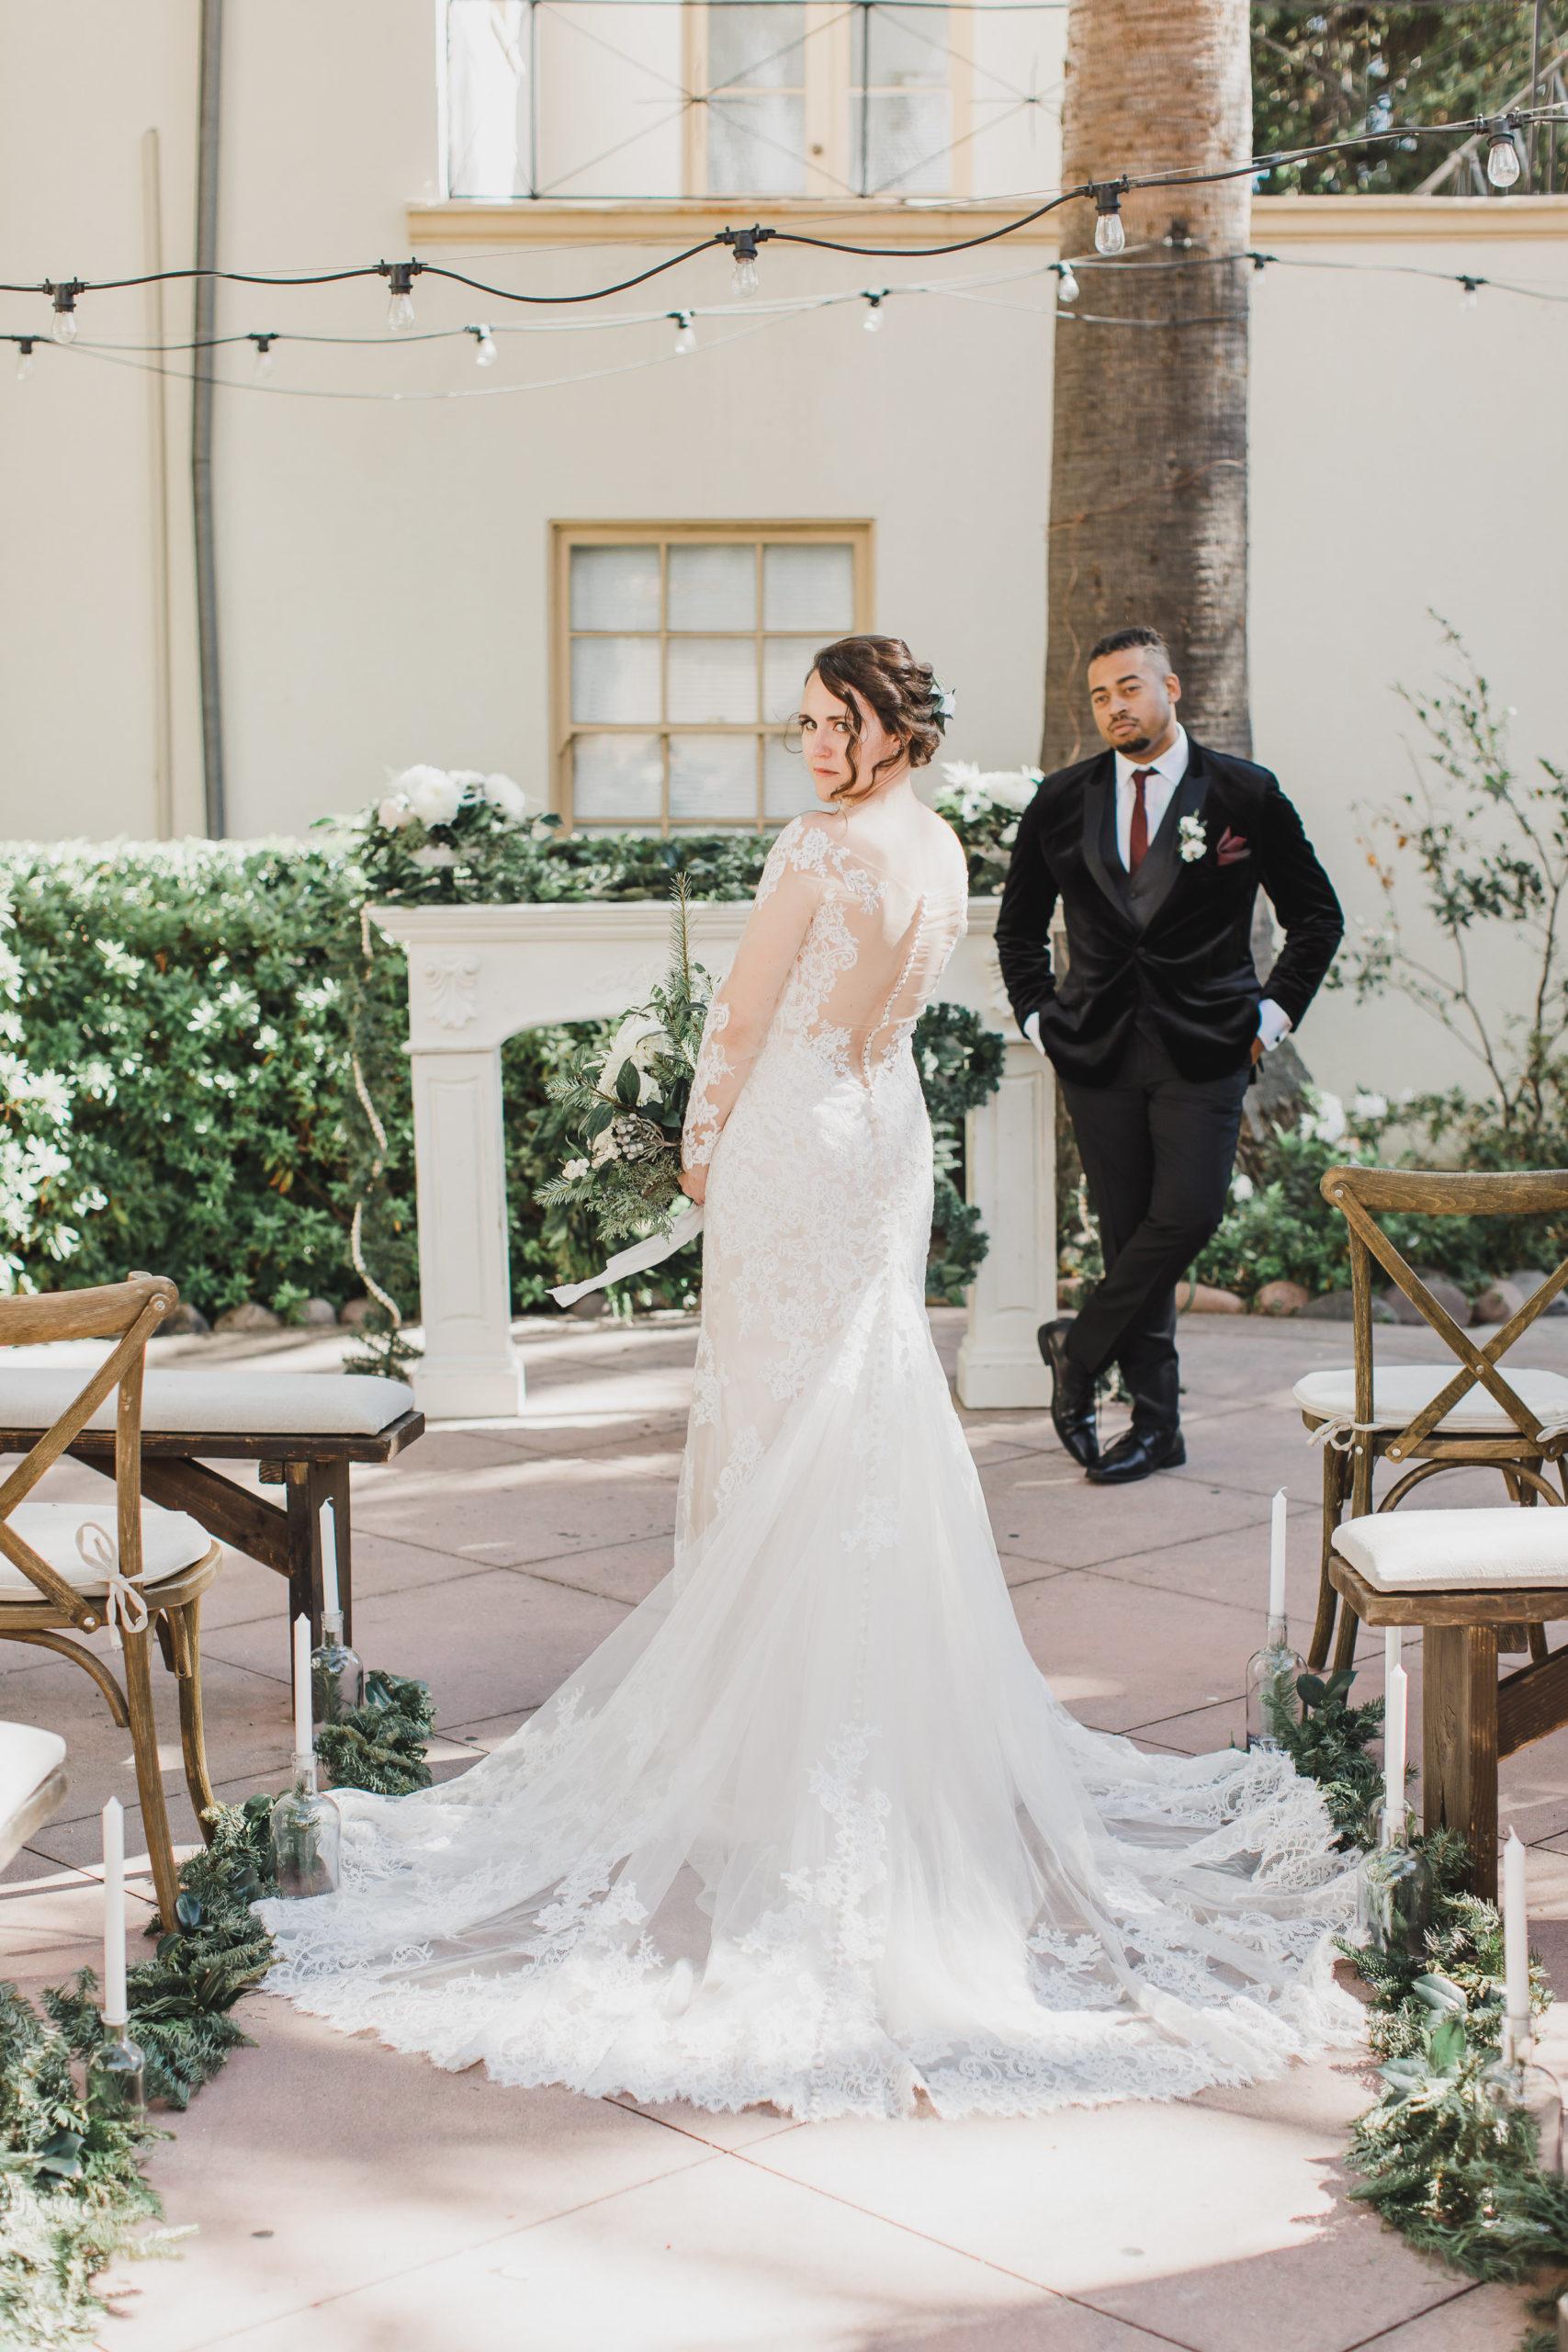 ceremony only wedding venue